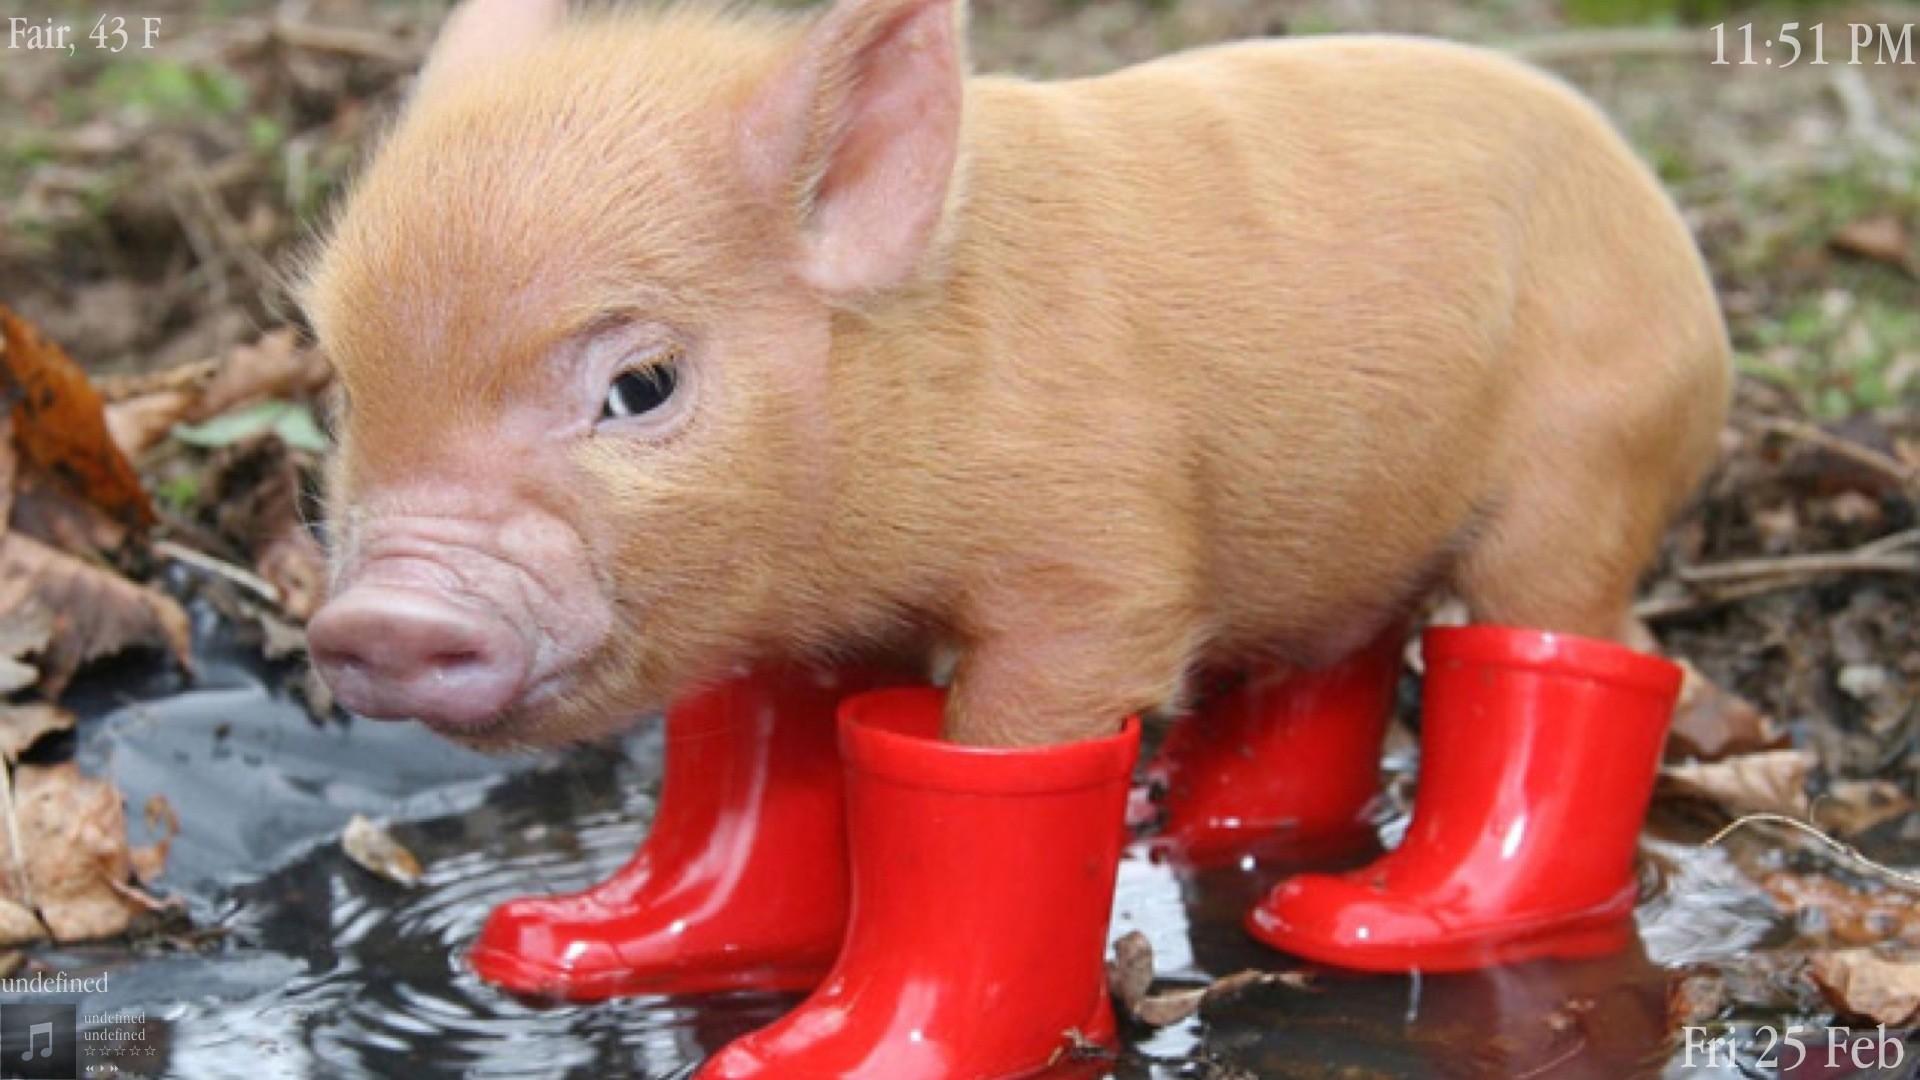 pig screensaver wallpaper 66 images